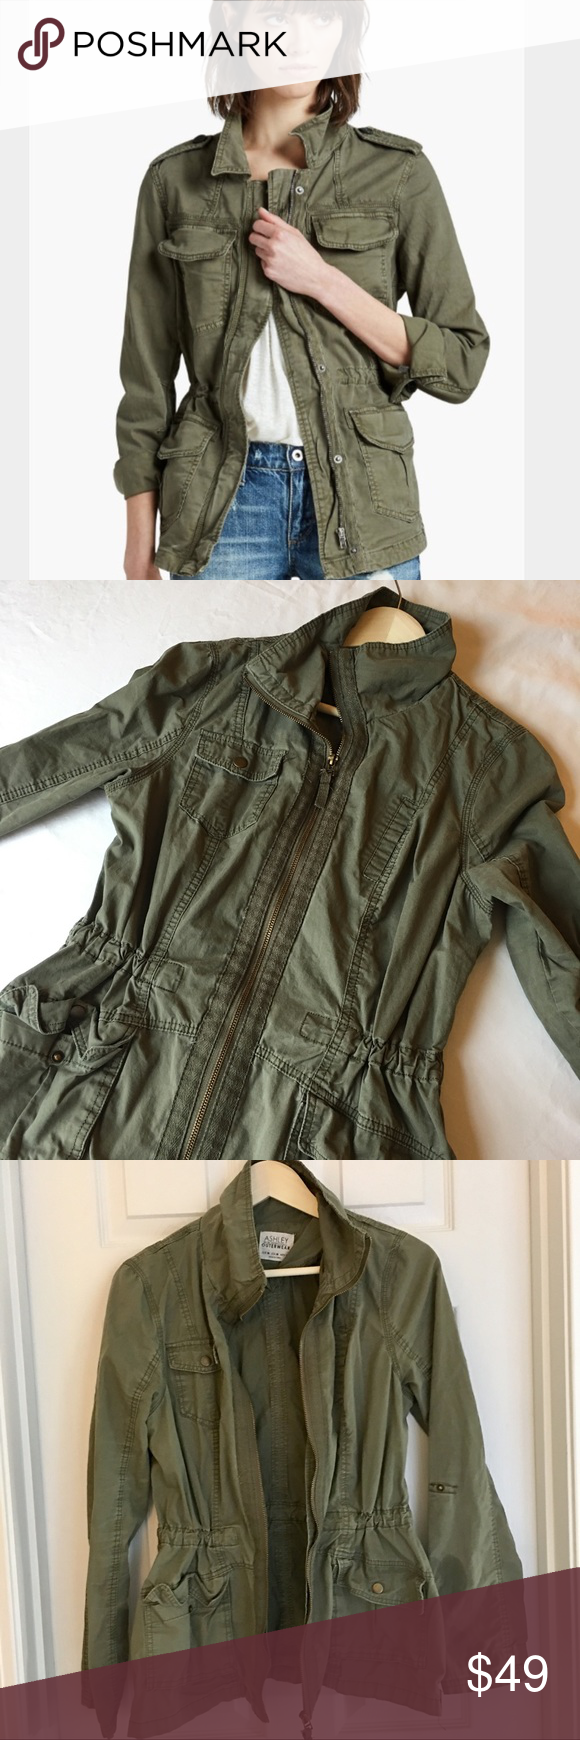 Ashley Outerwear By 26 Intl Green Utility Jacket Clothes Design Fashion Fashion Design [ 1740 x 580 Pixel ]